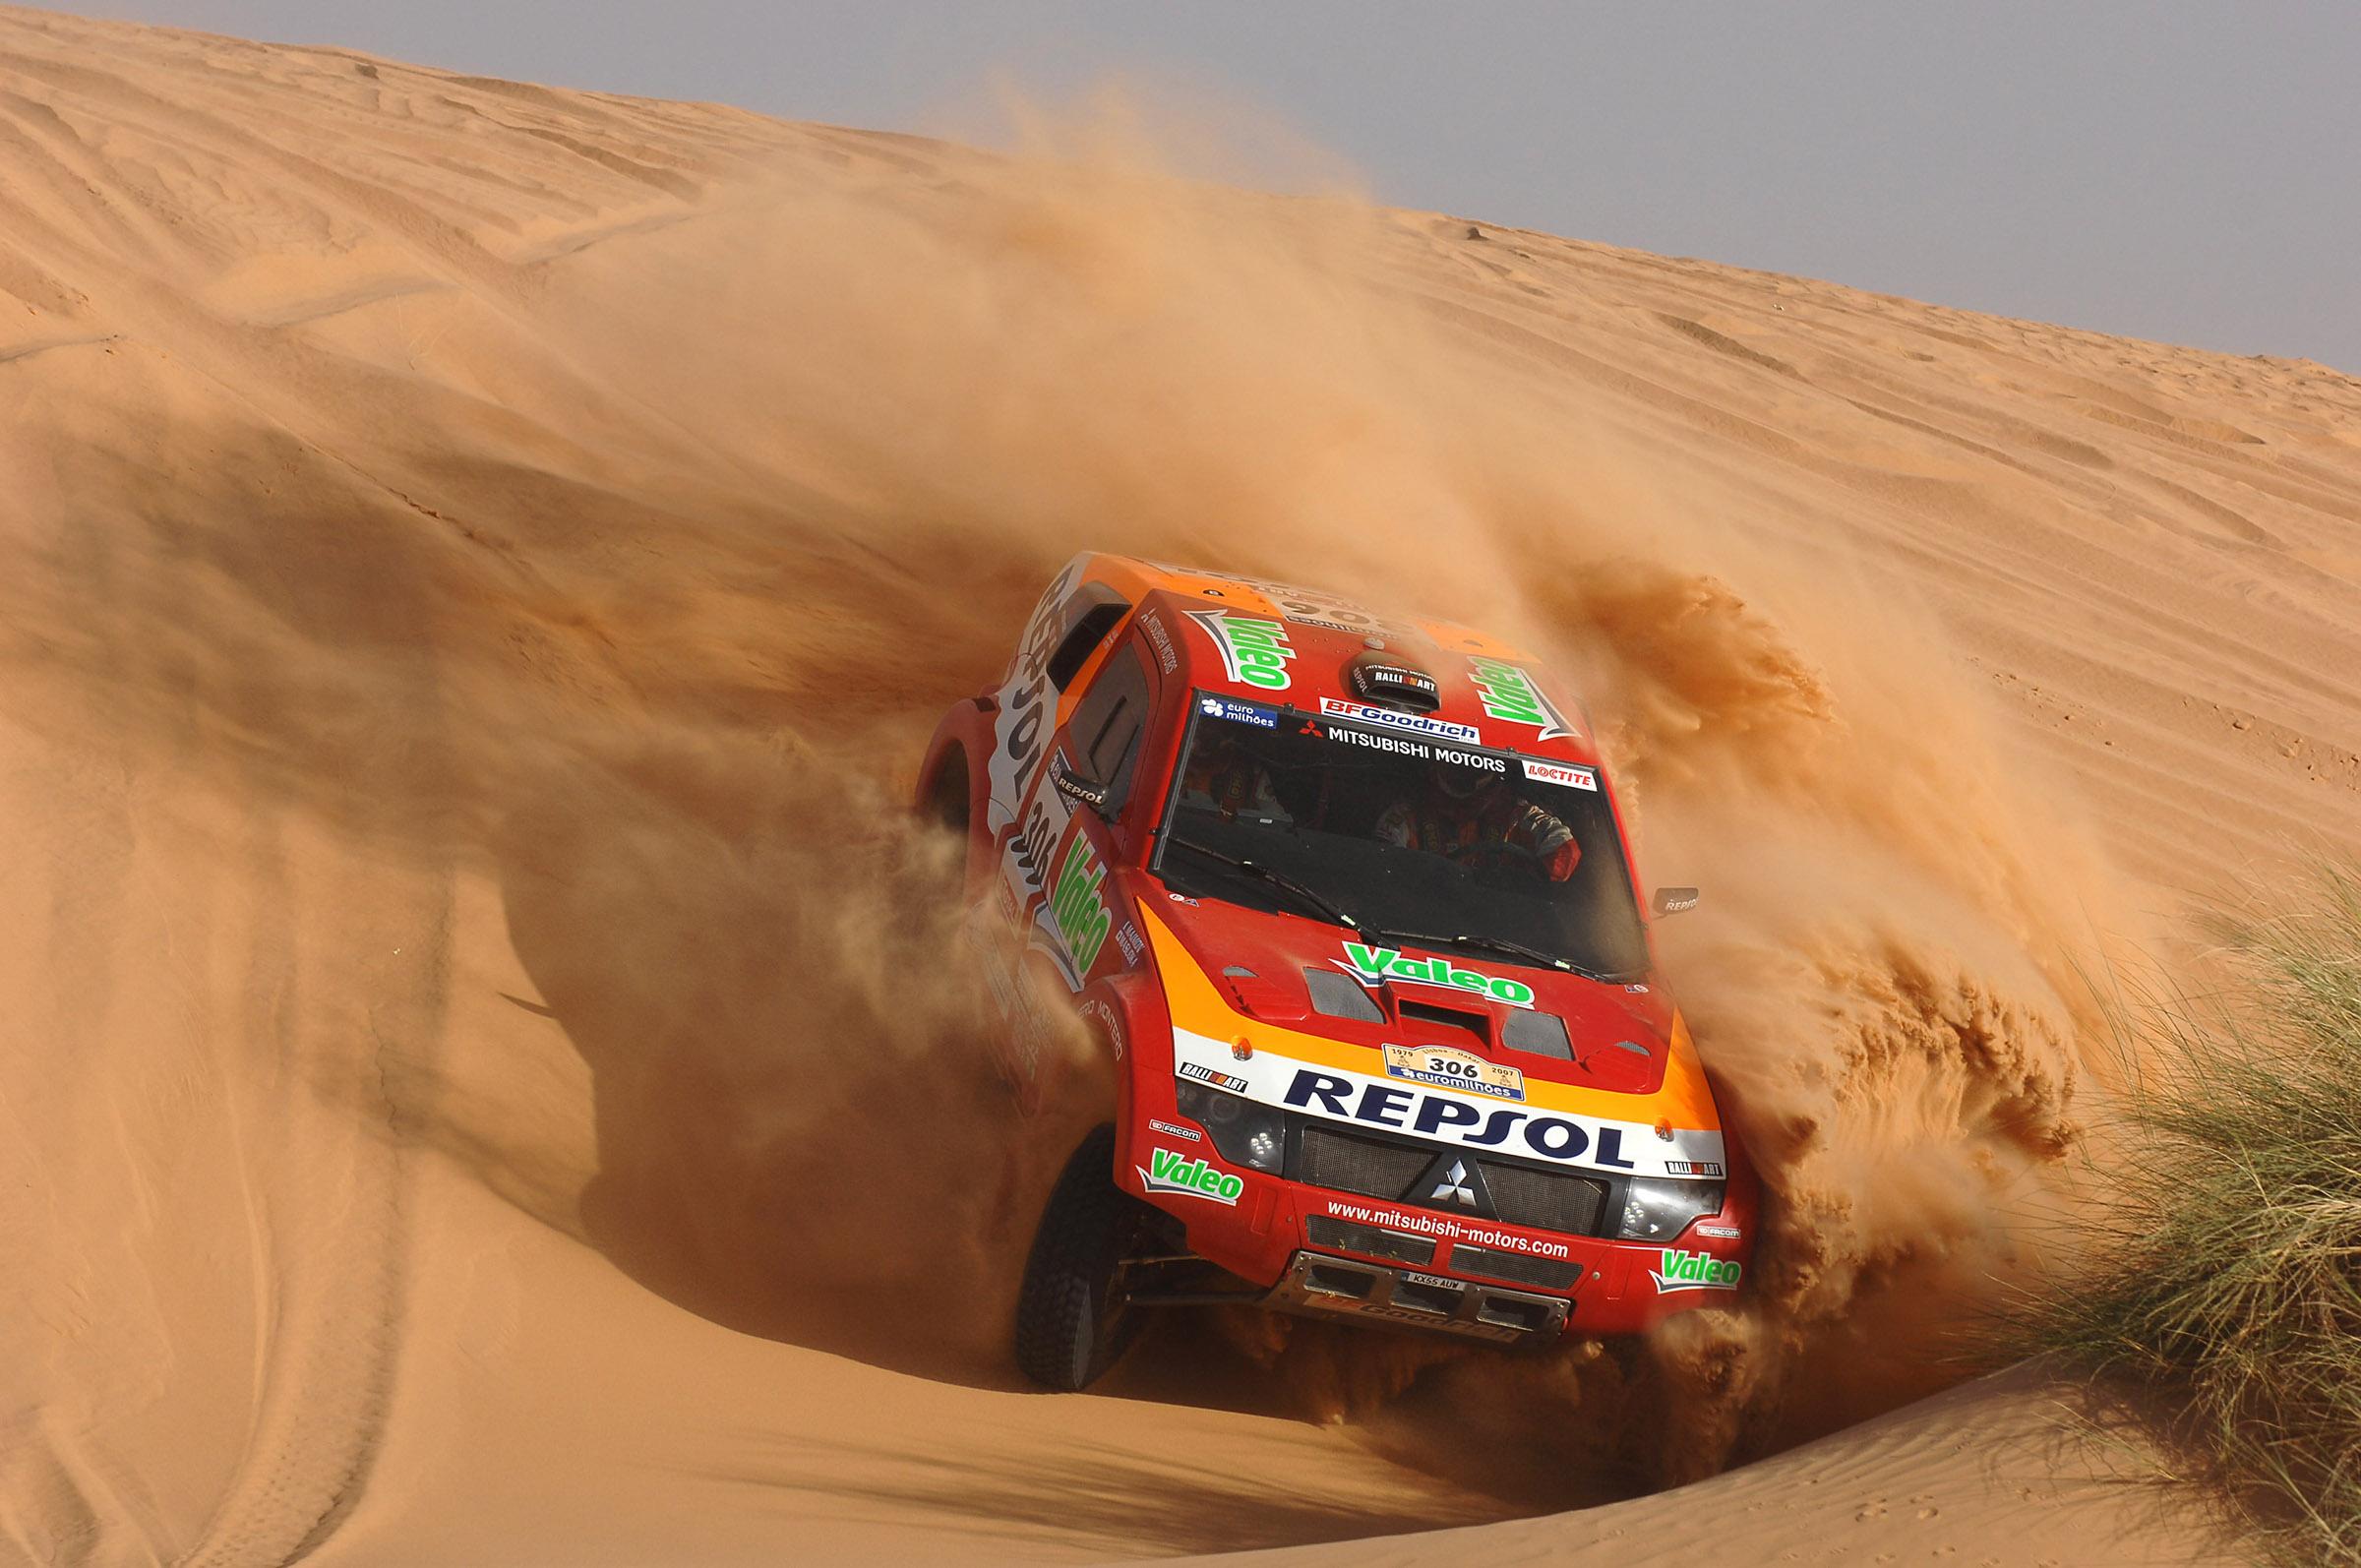 Mitsubishi truck on a sand dune